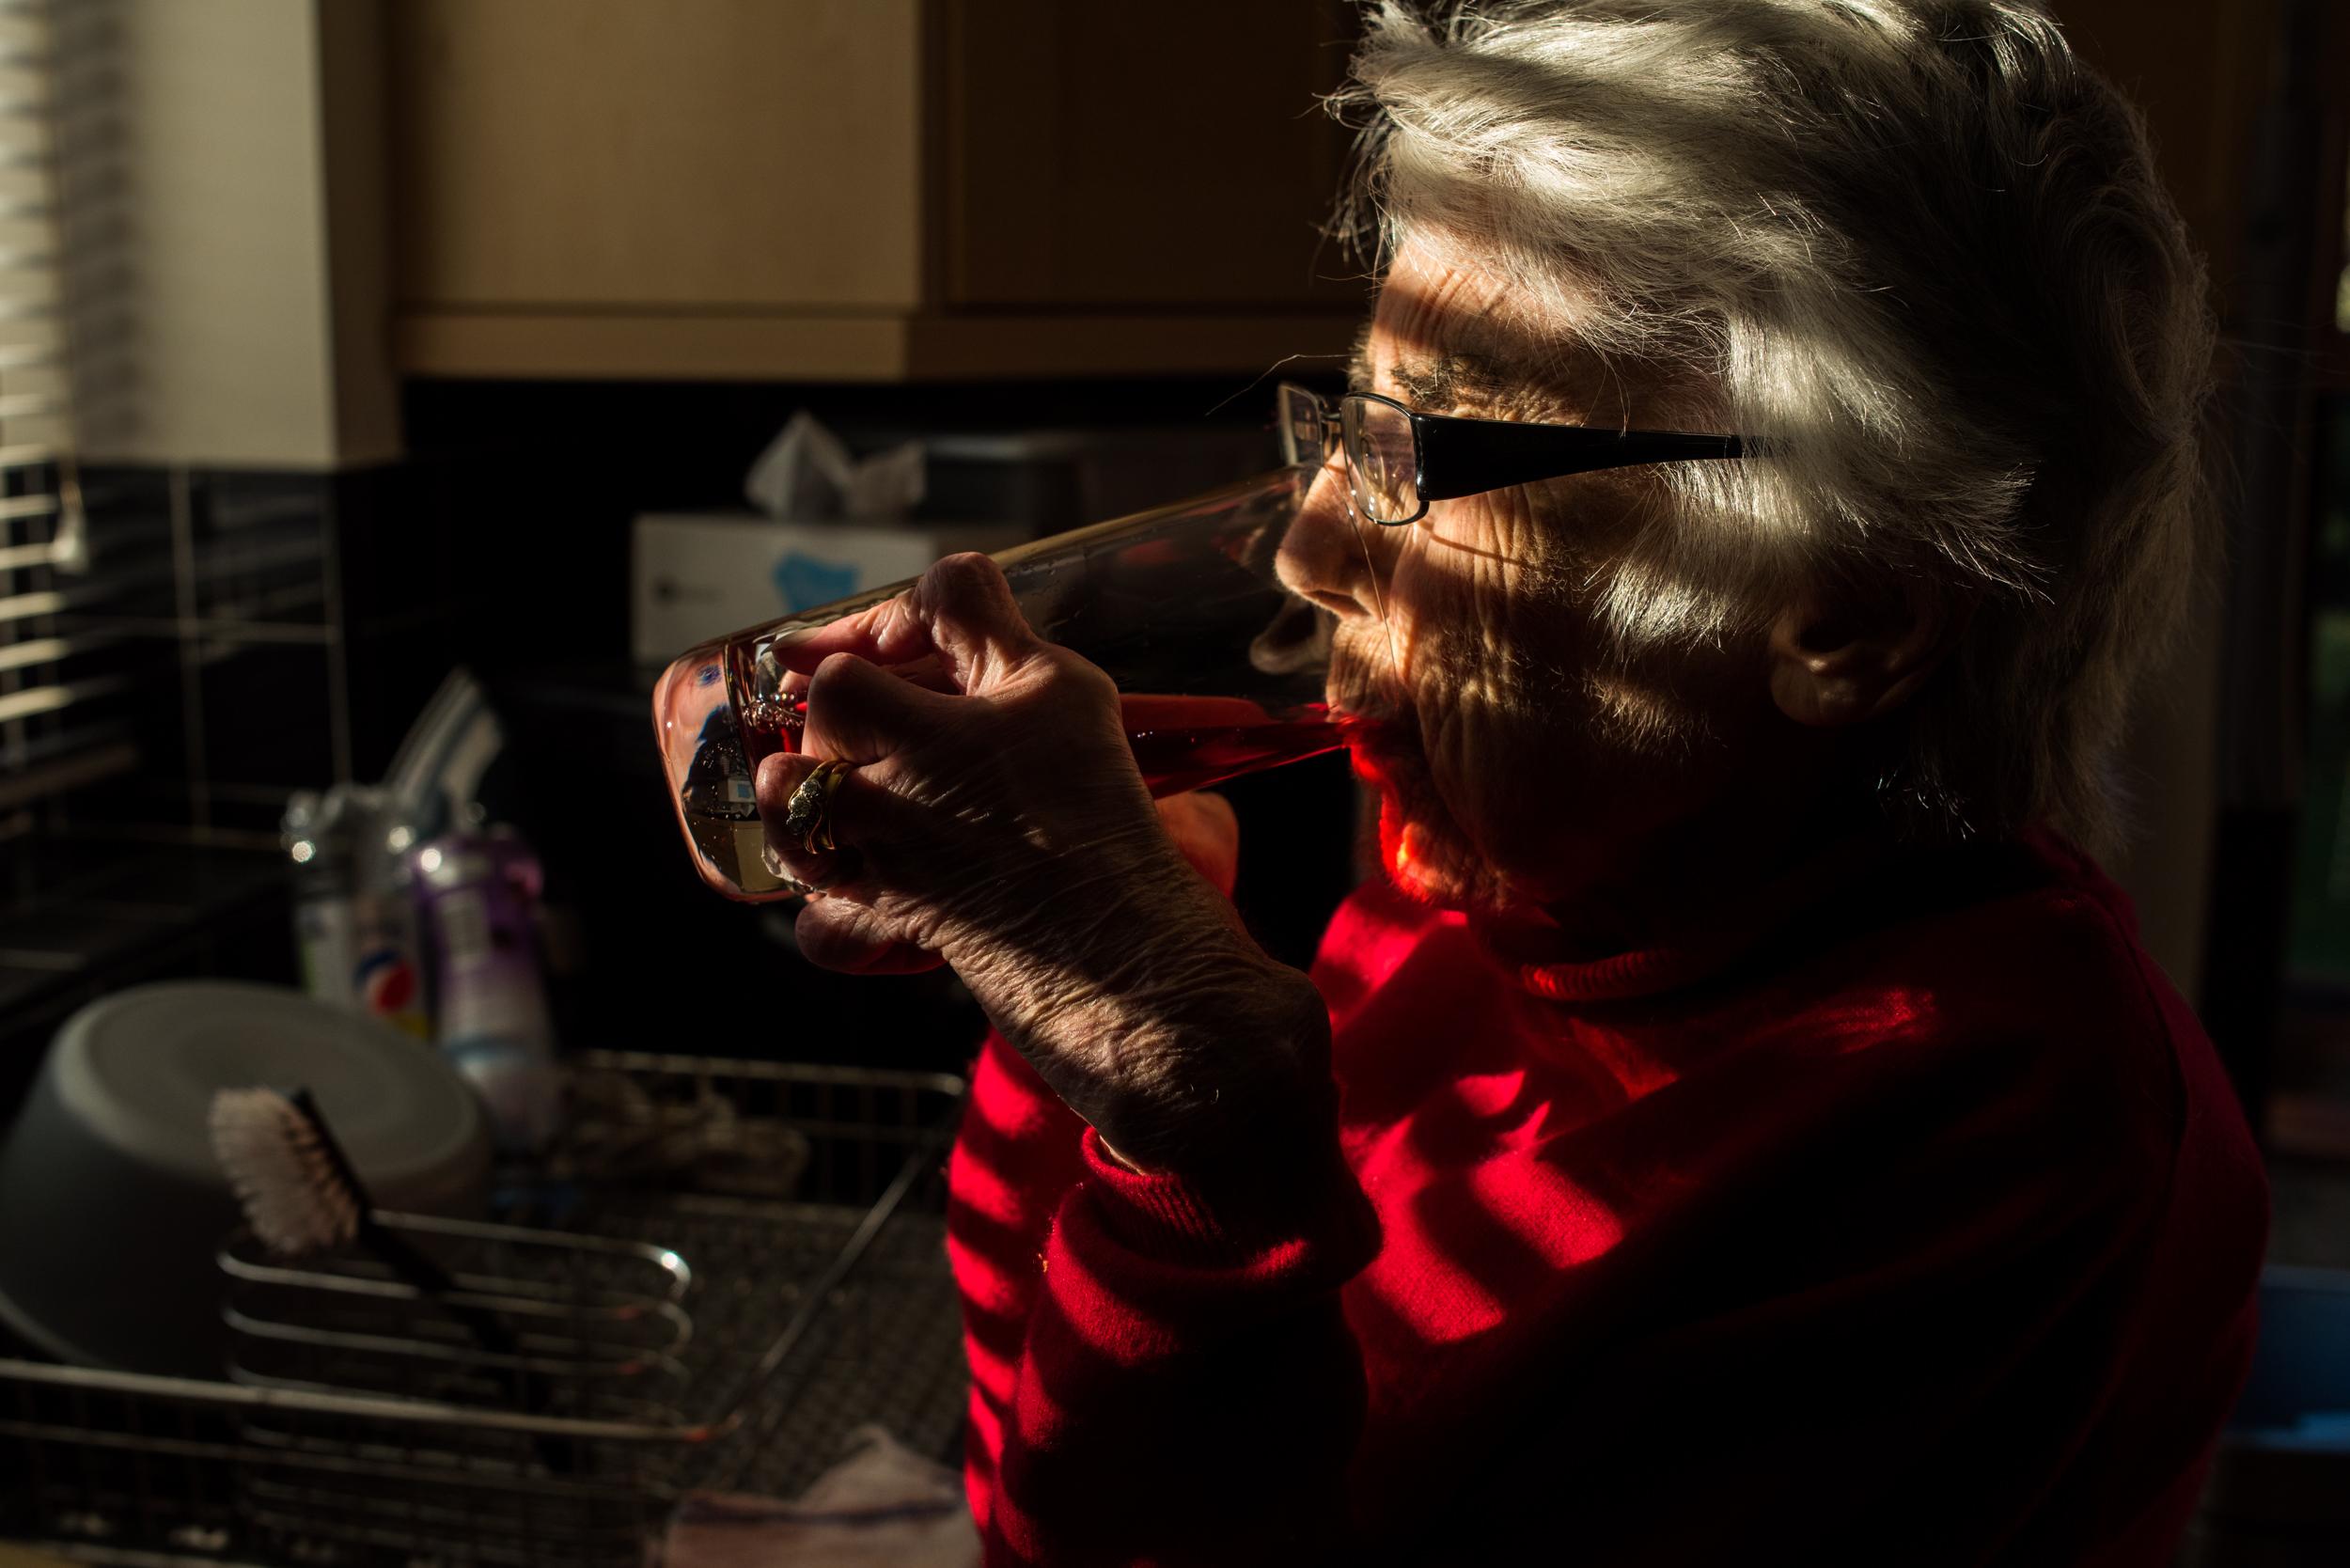 Swan Thumb - A story documenting Janet, A woman with severe Rheumatoid Arthritis